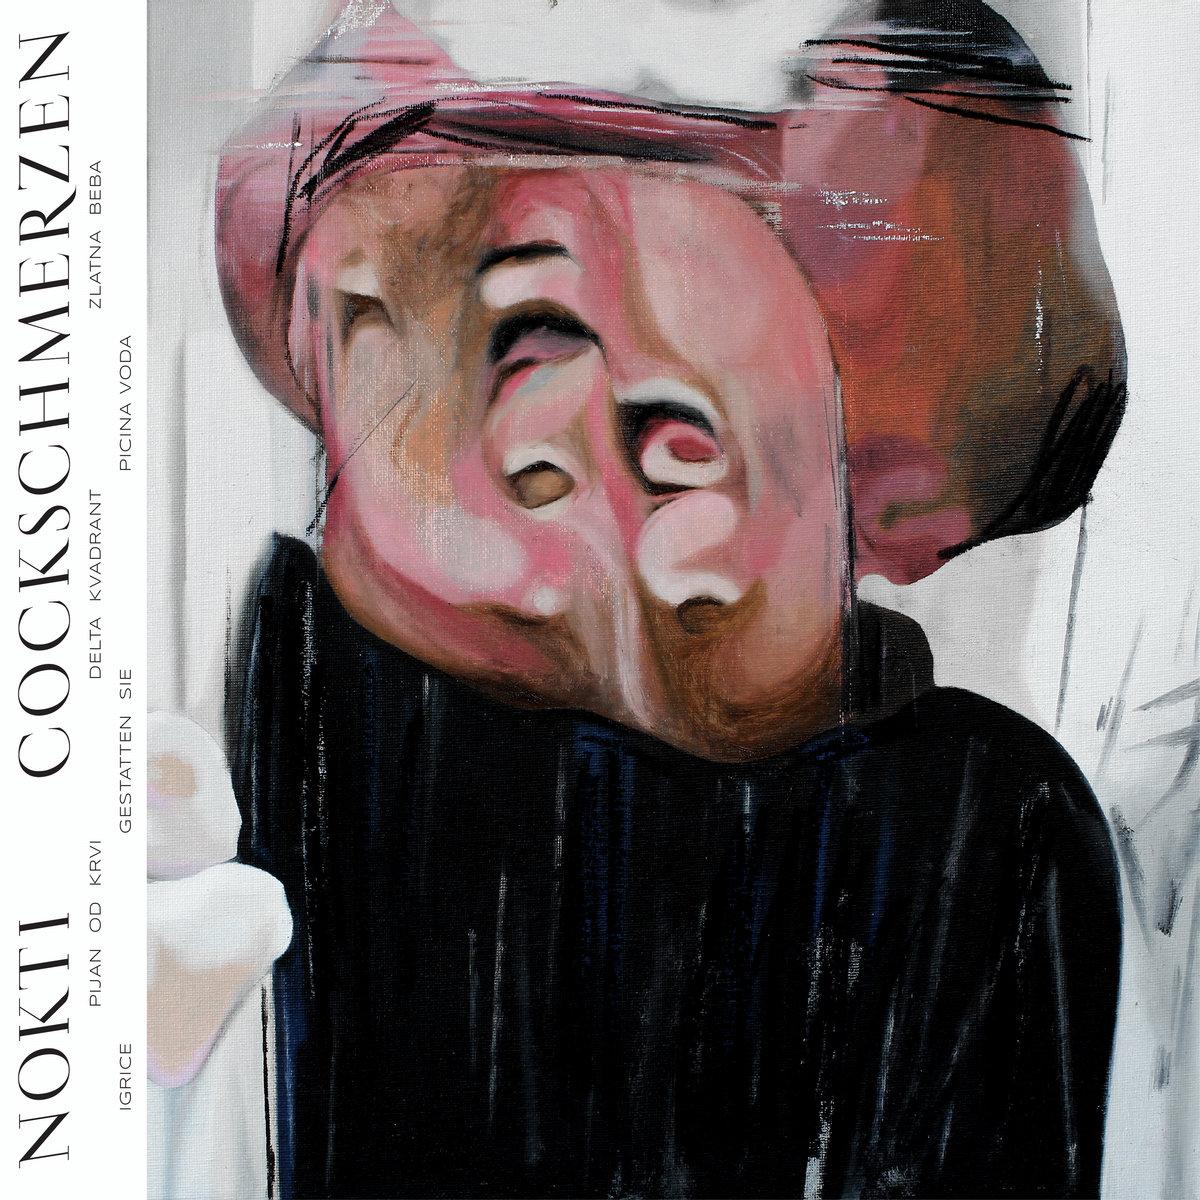 nokti-objavili-prvi-album-cockschmerzen